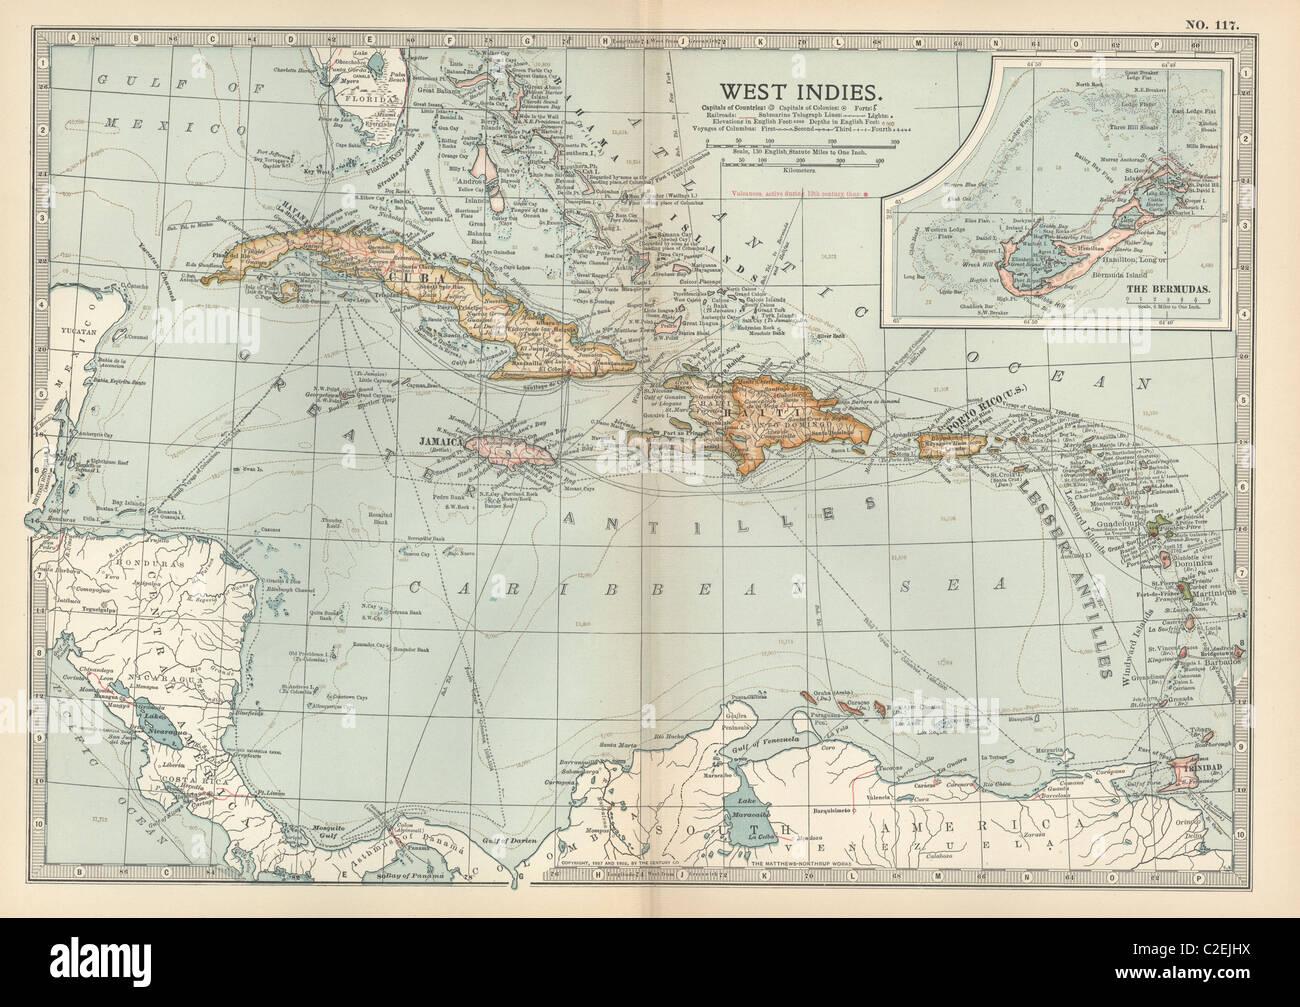 British West Indies Map Stock Photos & British West Indies Map Stock ...